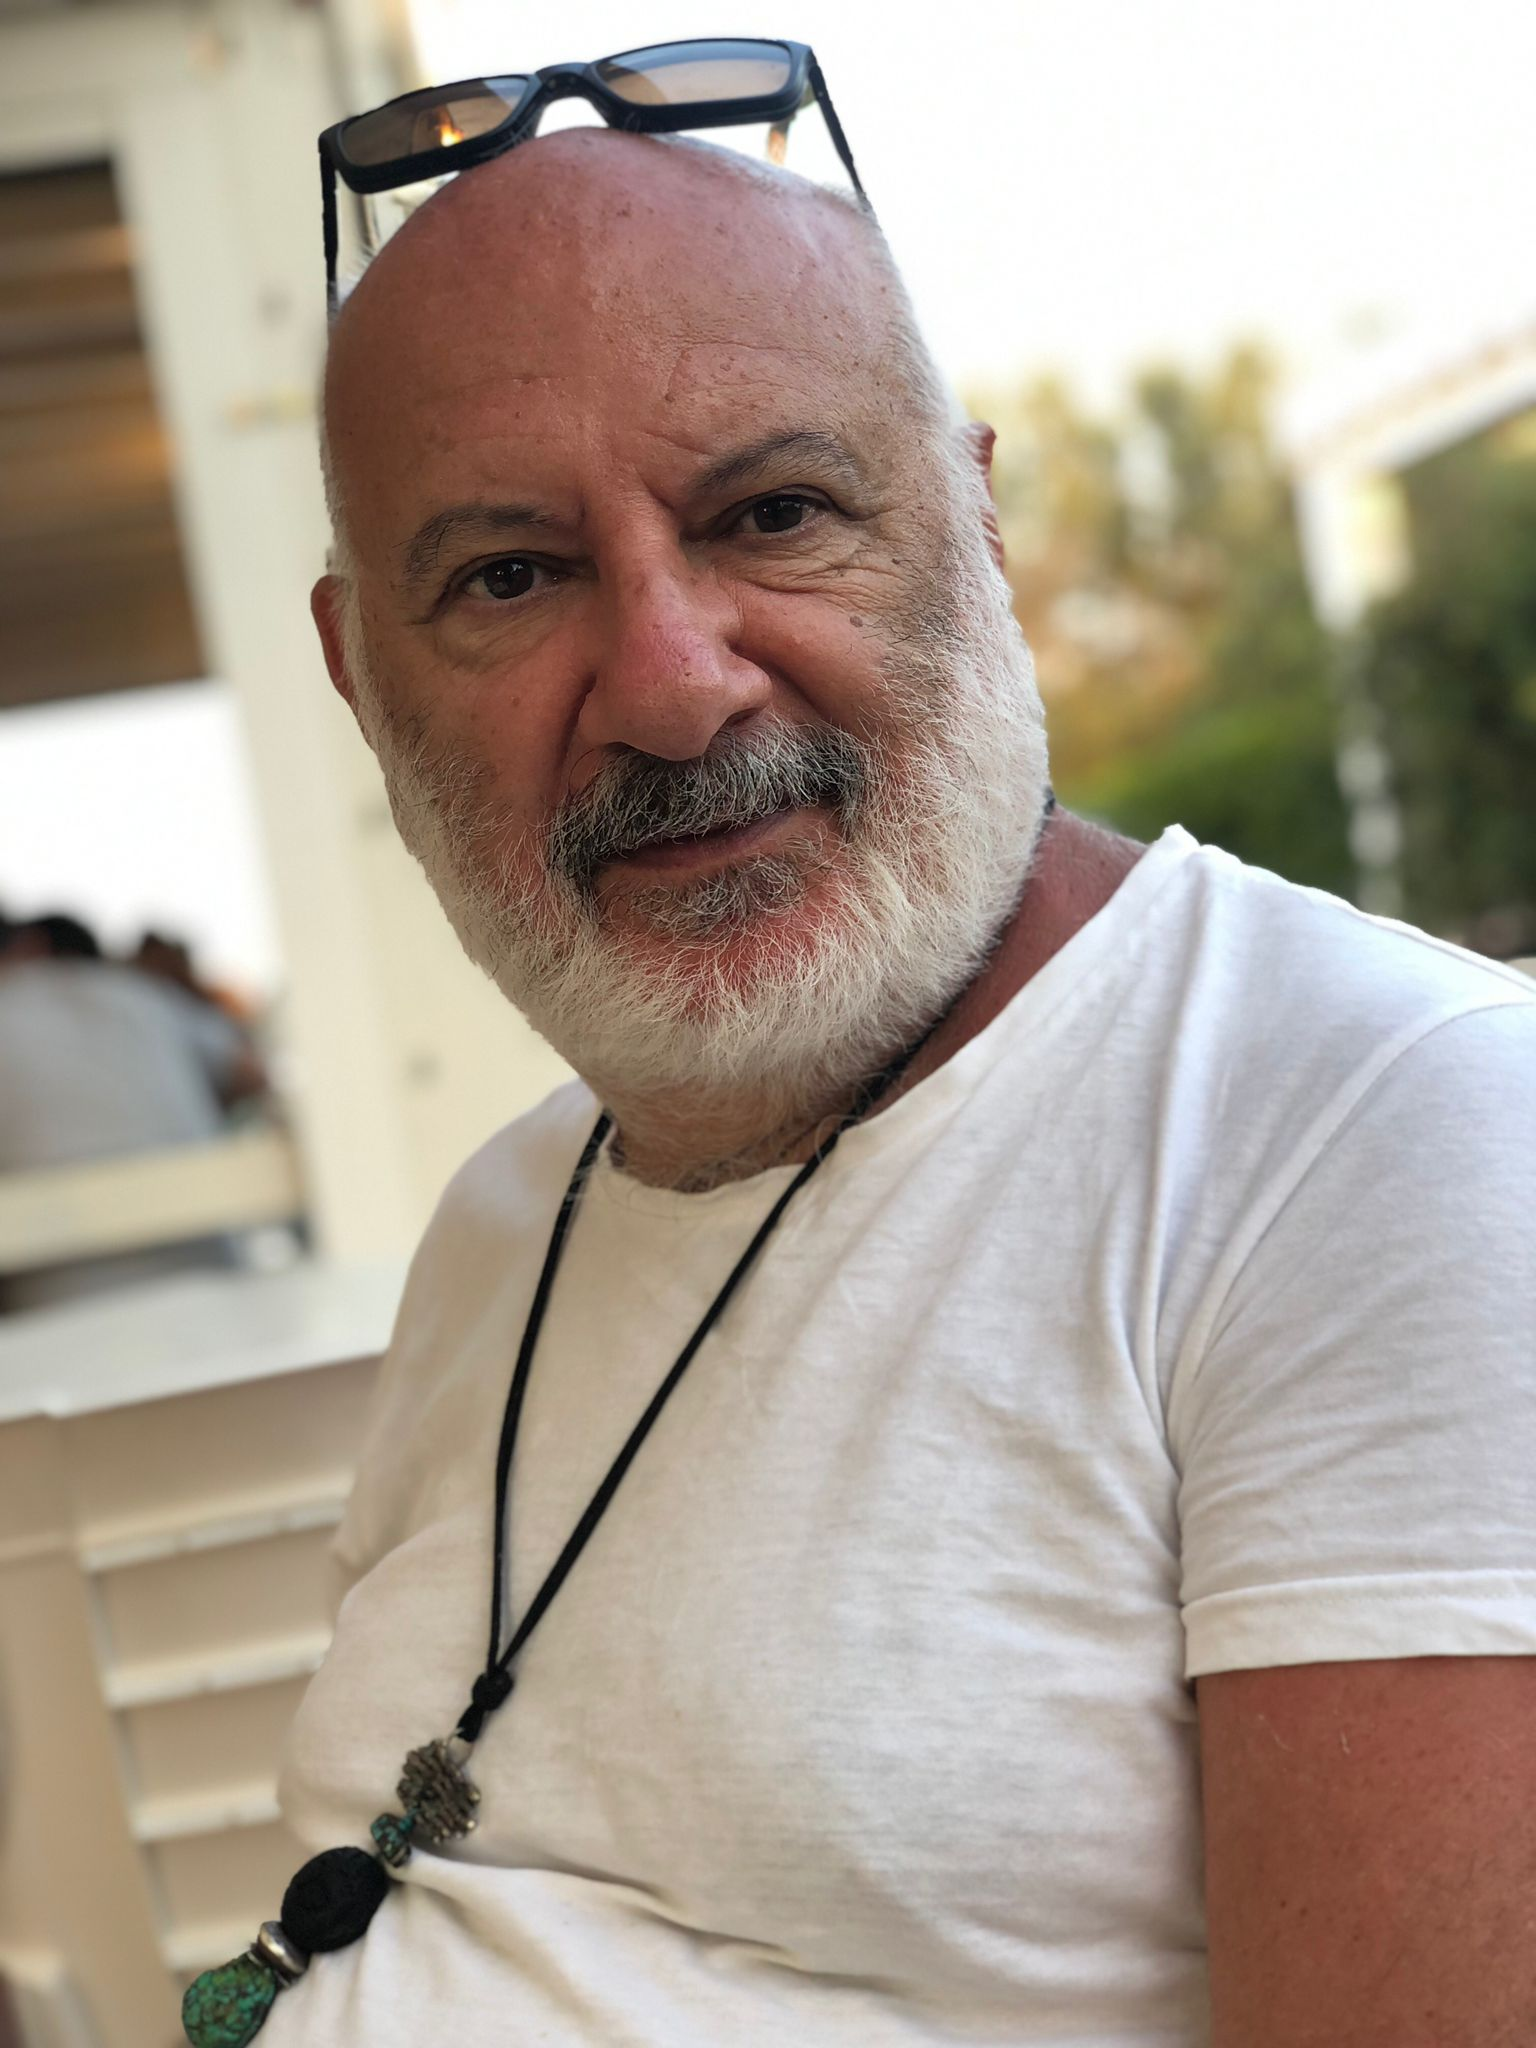 Zeno Zappi